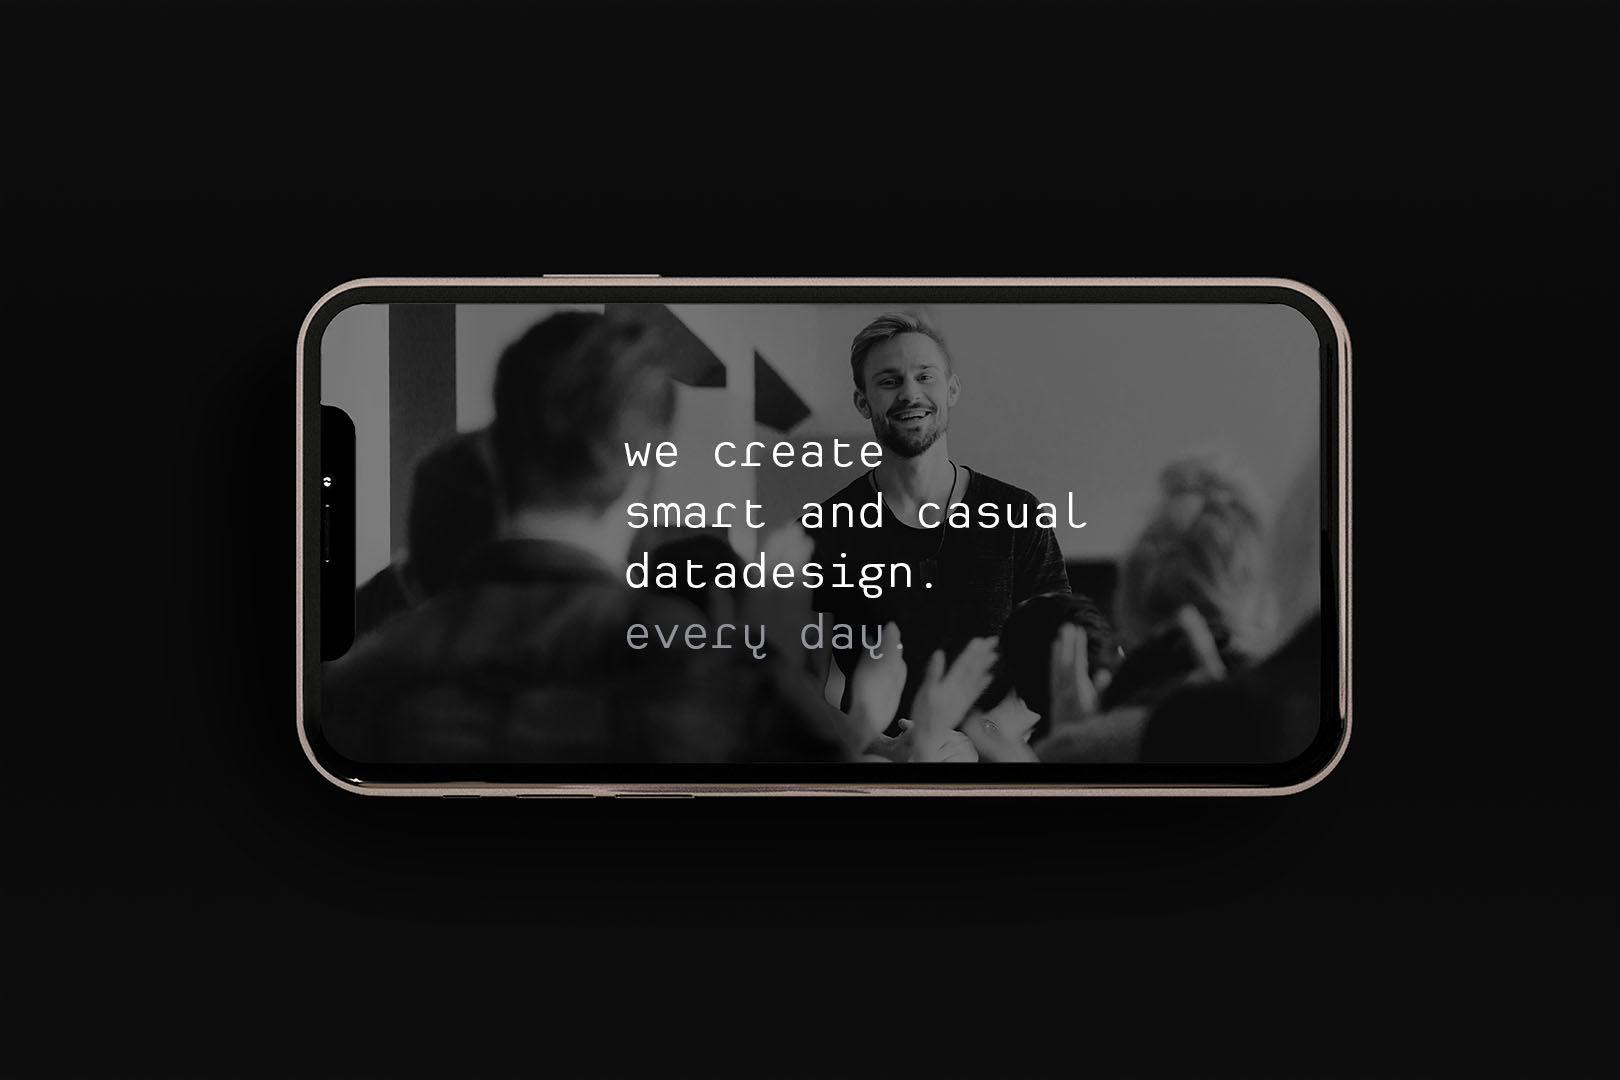 Smart casual <br>Datadesign